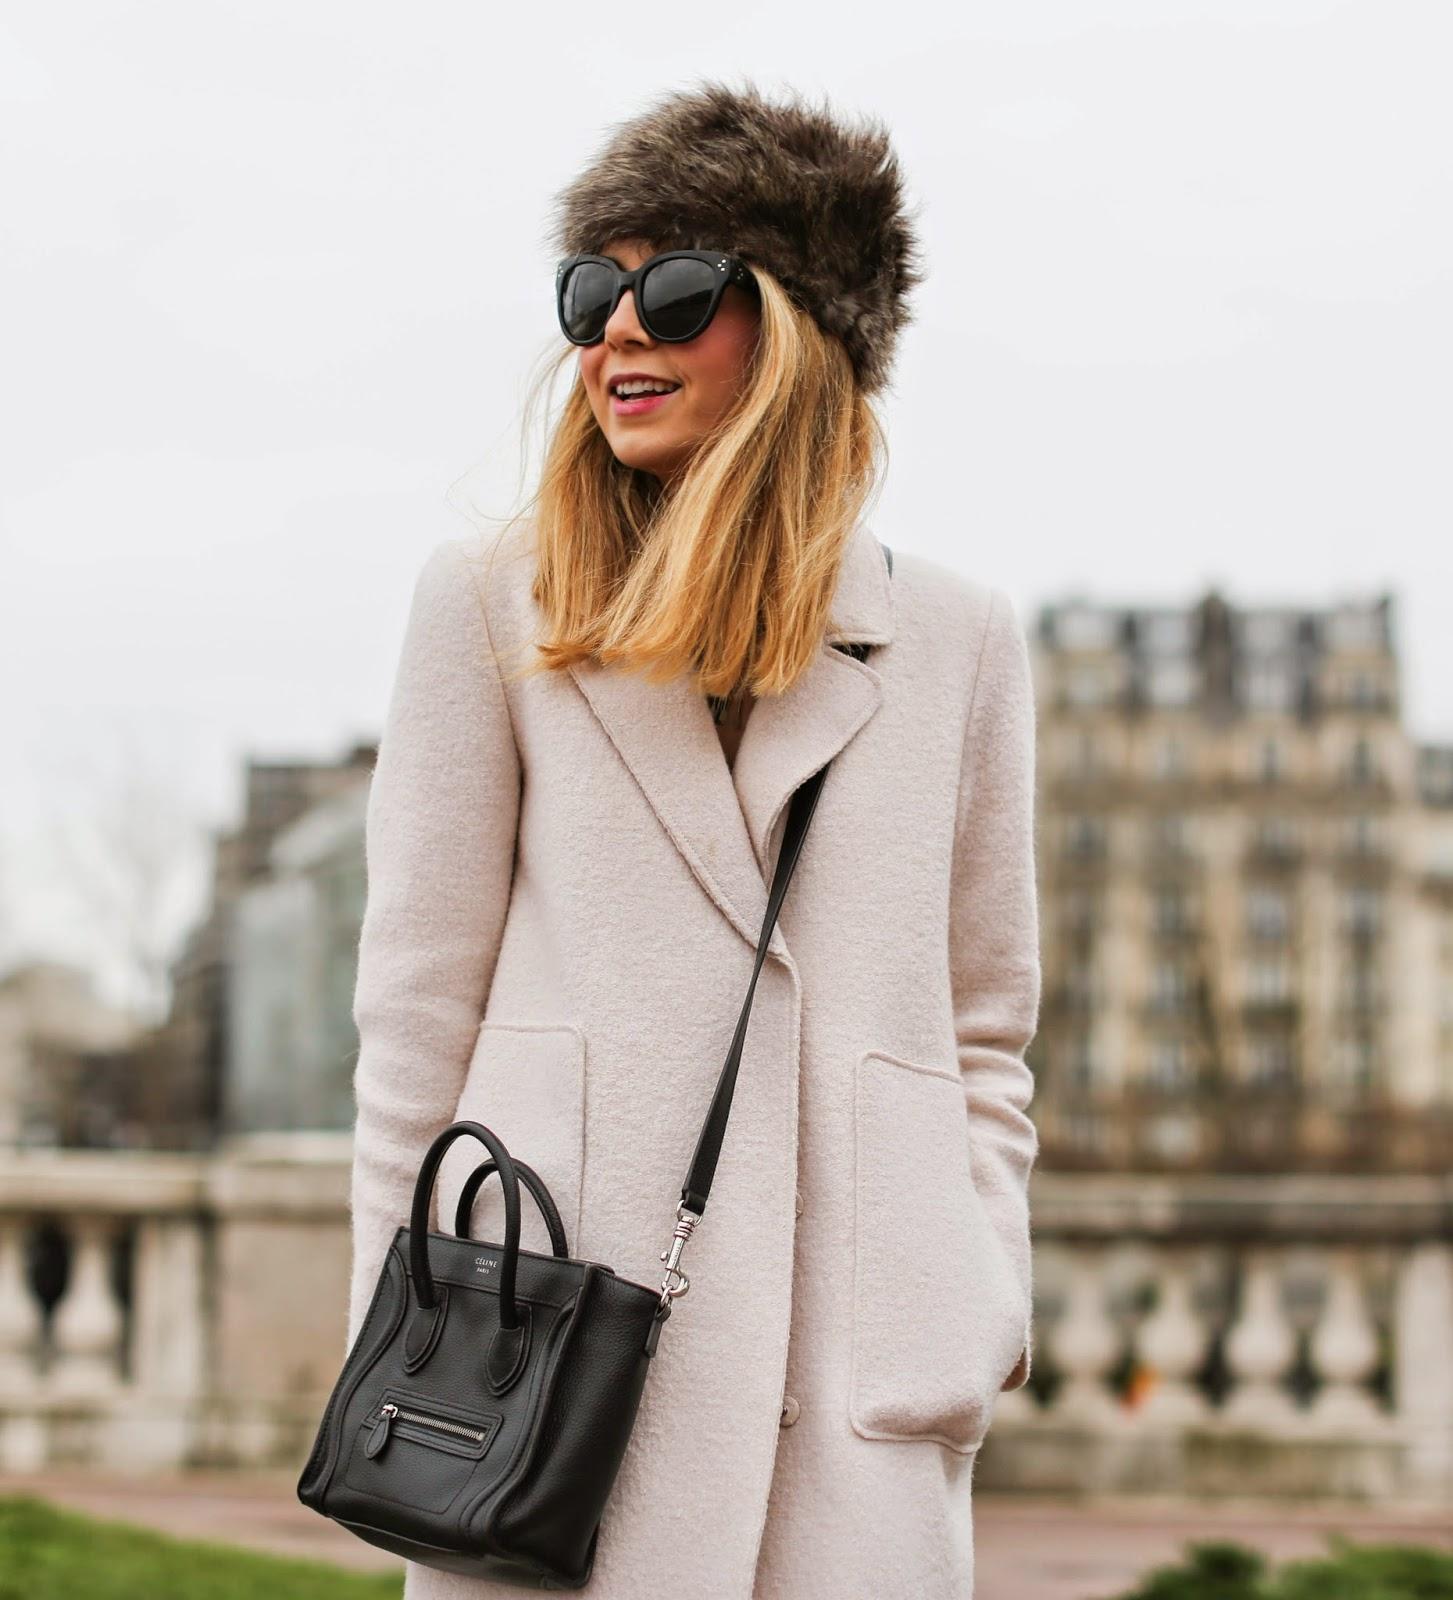 zara, pale pink, python slipons, blk dnm, fur hat, eiffel tower, streetstyle paris, fashion blogger